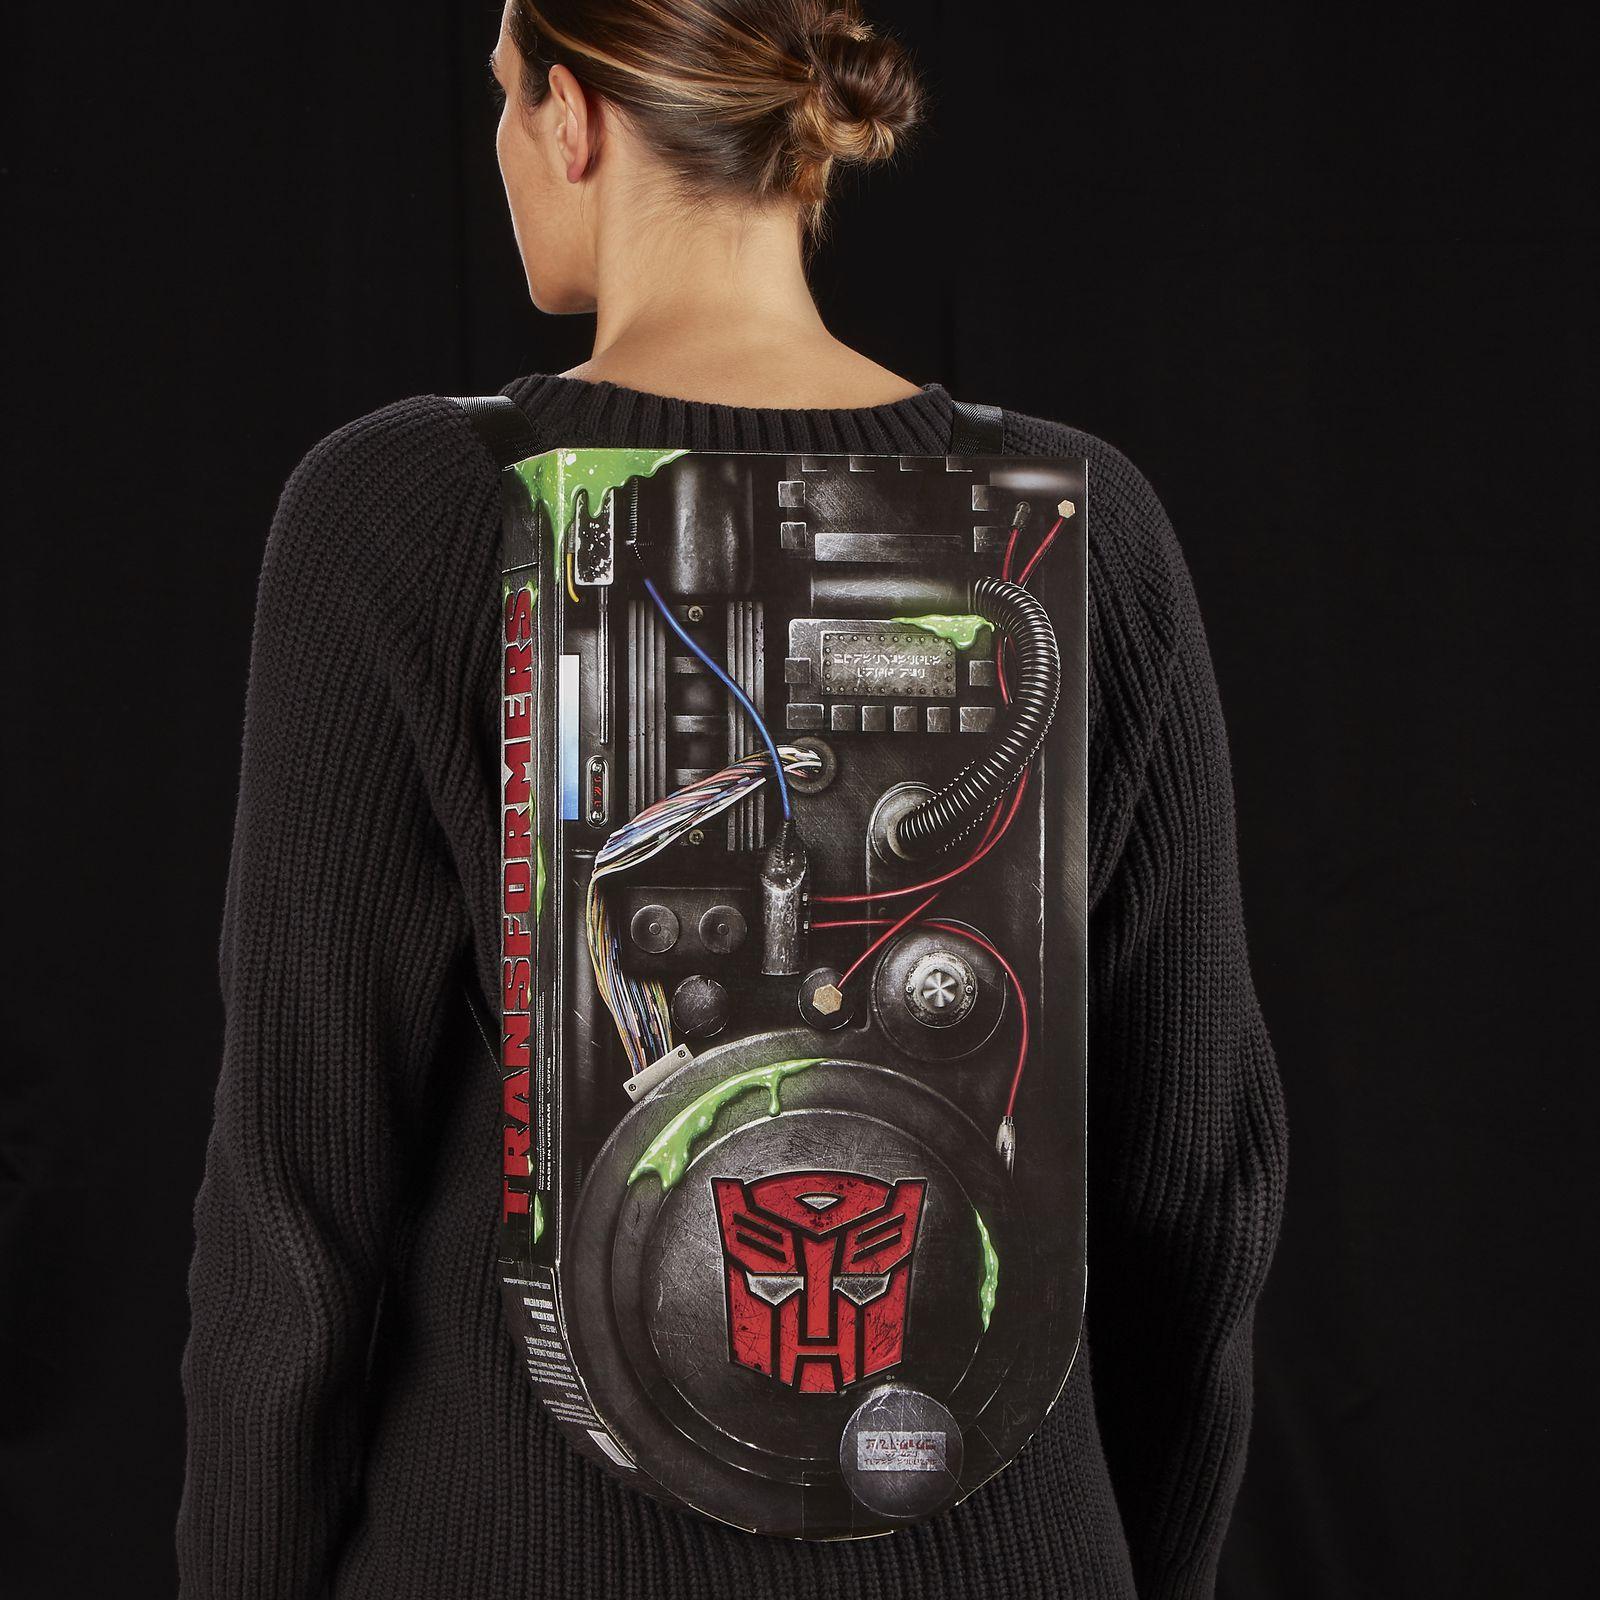 MP-10G Optimus Prime Ecto-35 Edition